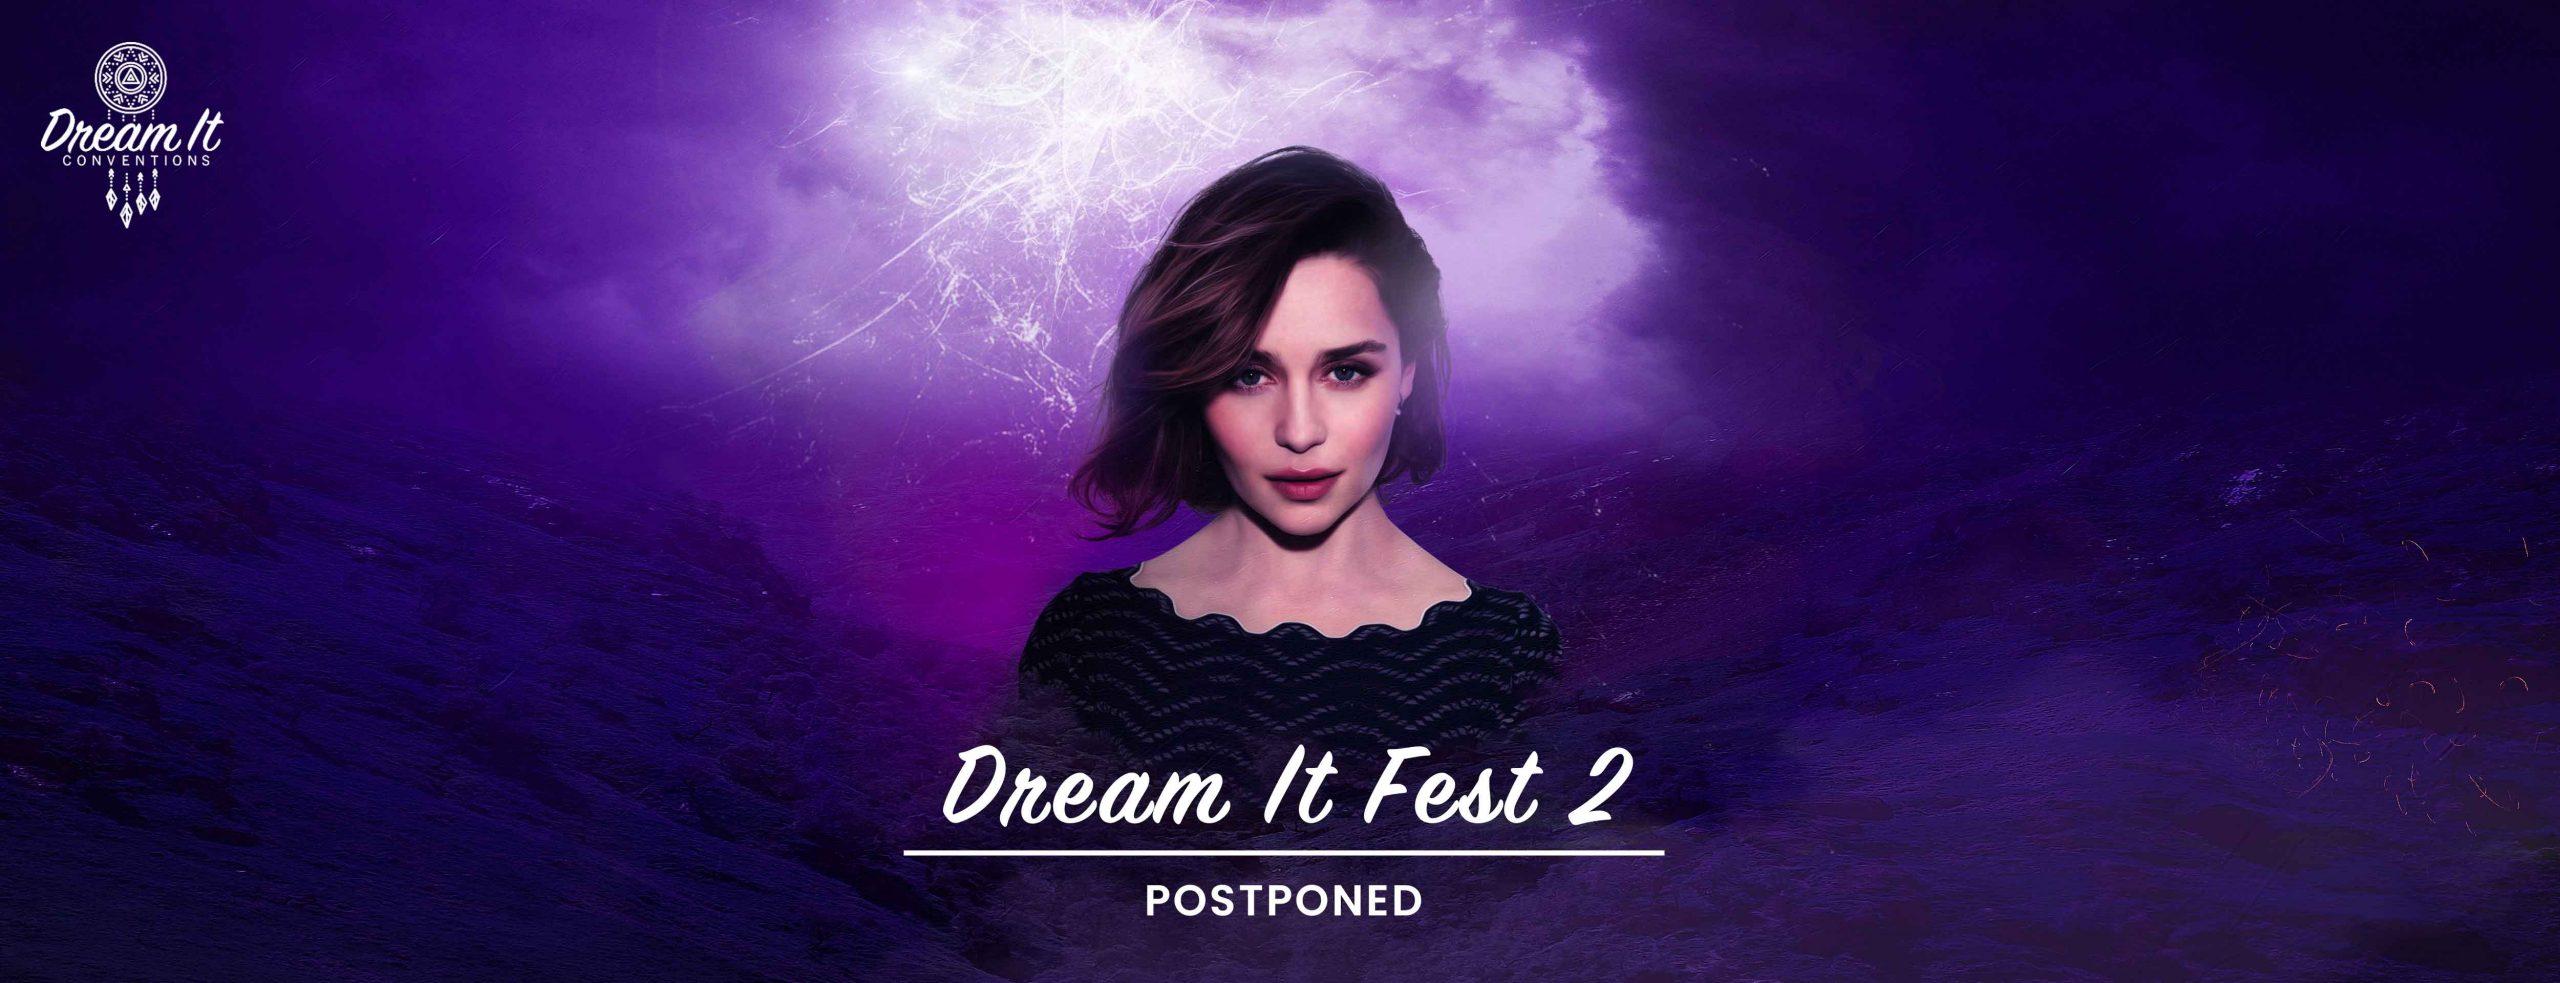 Dream It Fest London